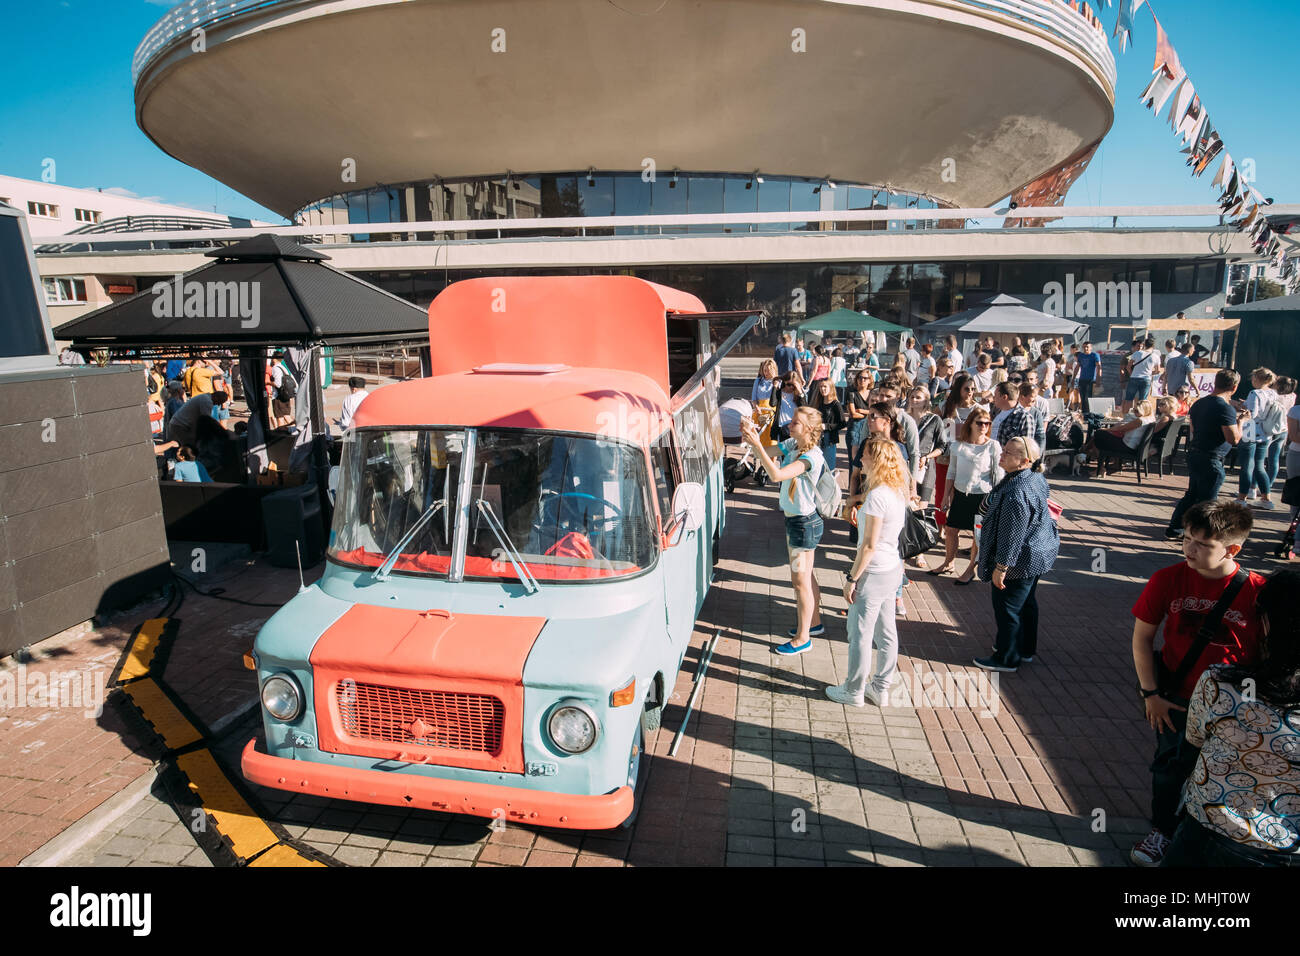 Gomel, Belarus. People Walking Near Food Car On Gastronomic Festival City Food In Summer Sunny Day. - Stock Image